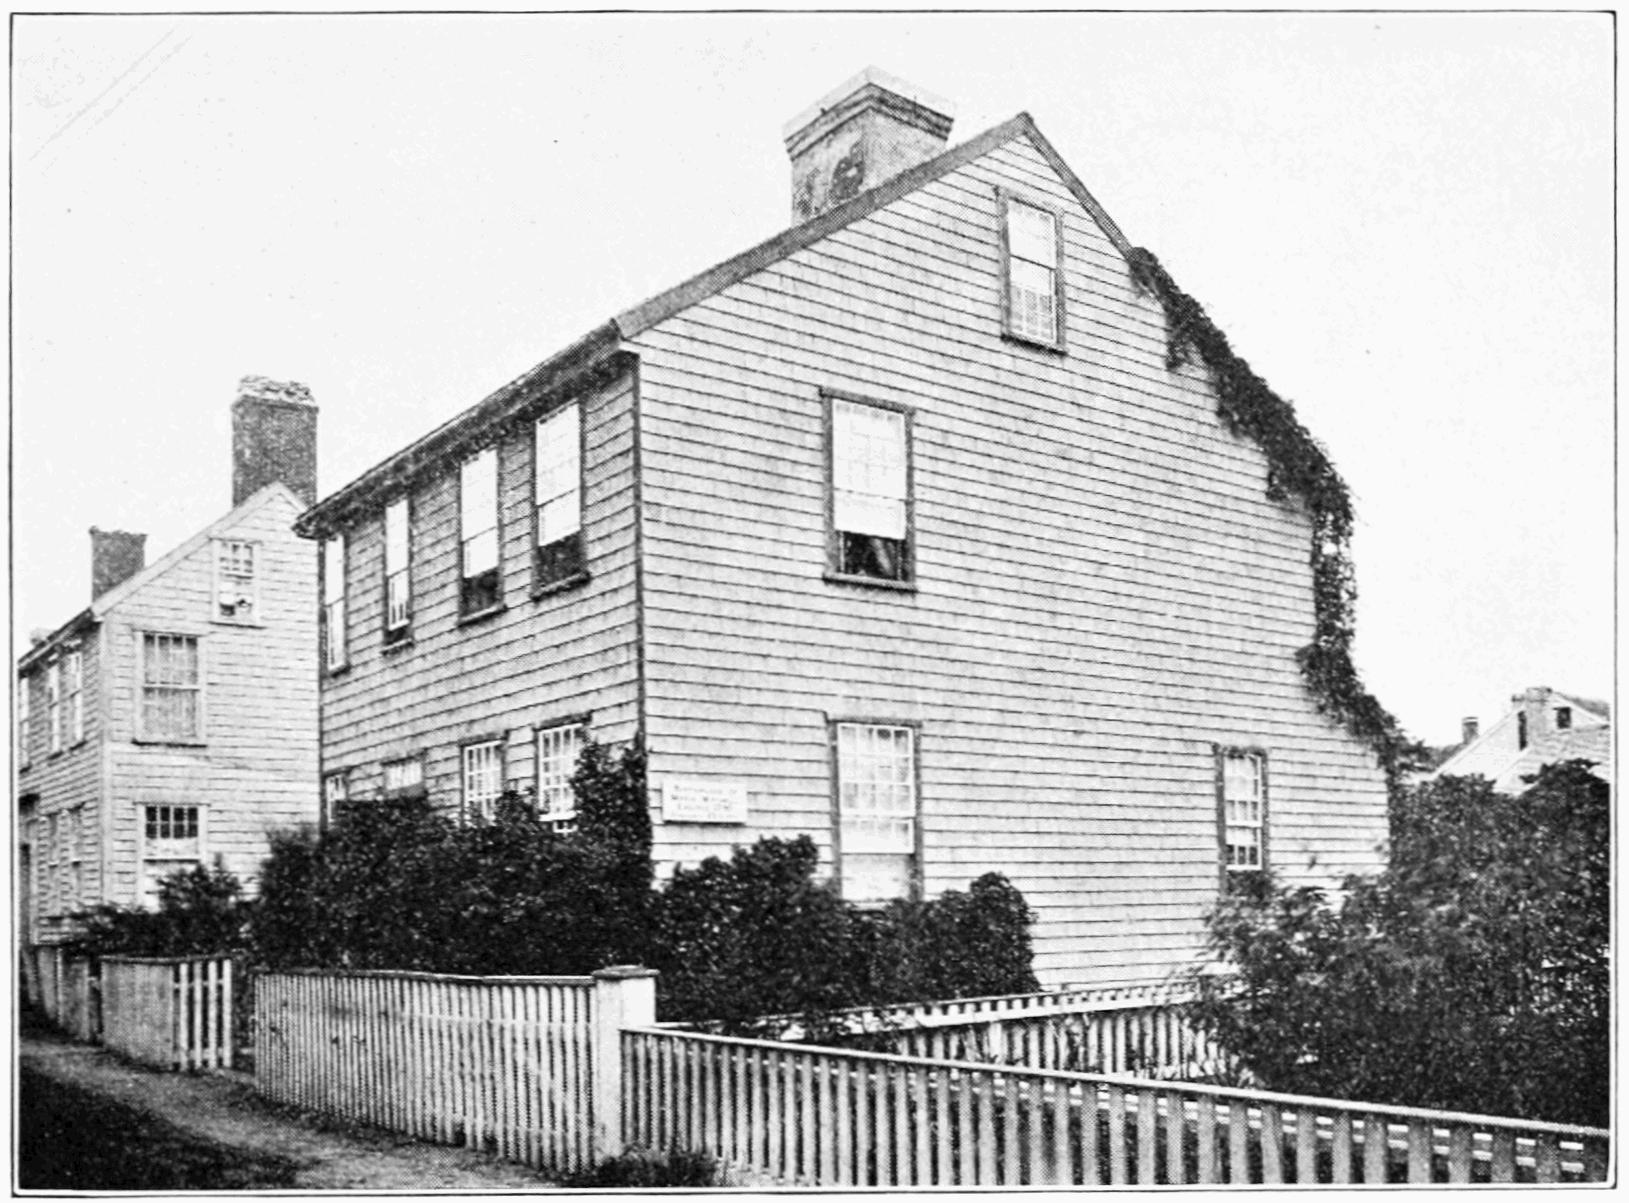 Memorial de María Mitchell en Nantucket. Crédito: Wikimedia